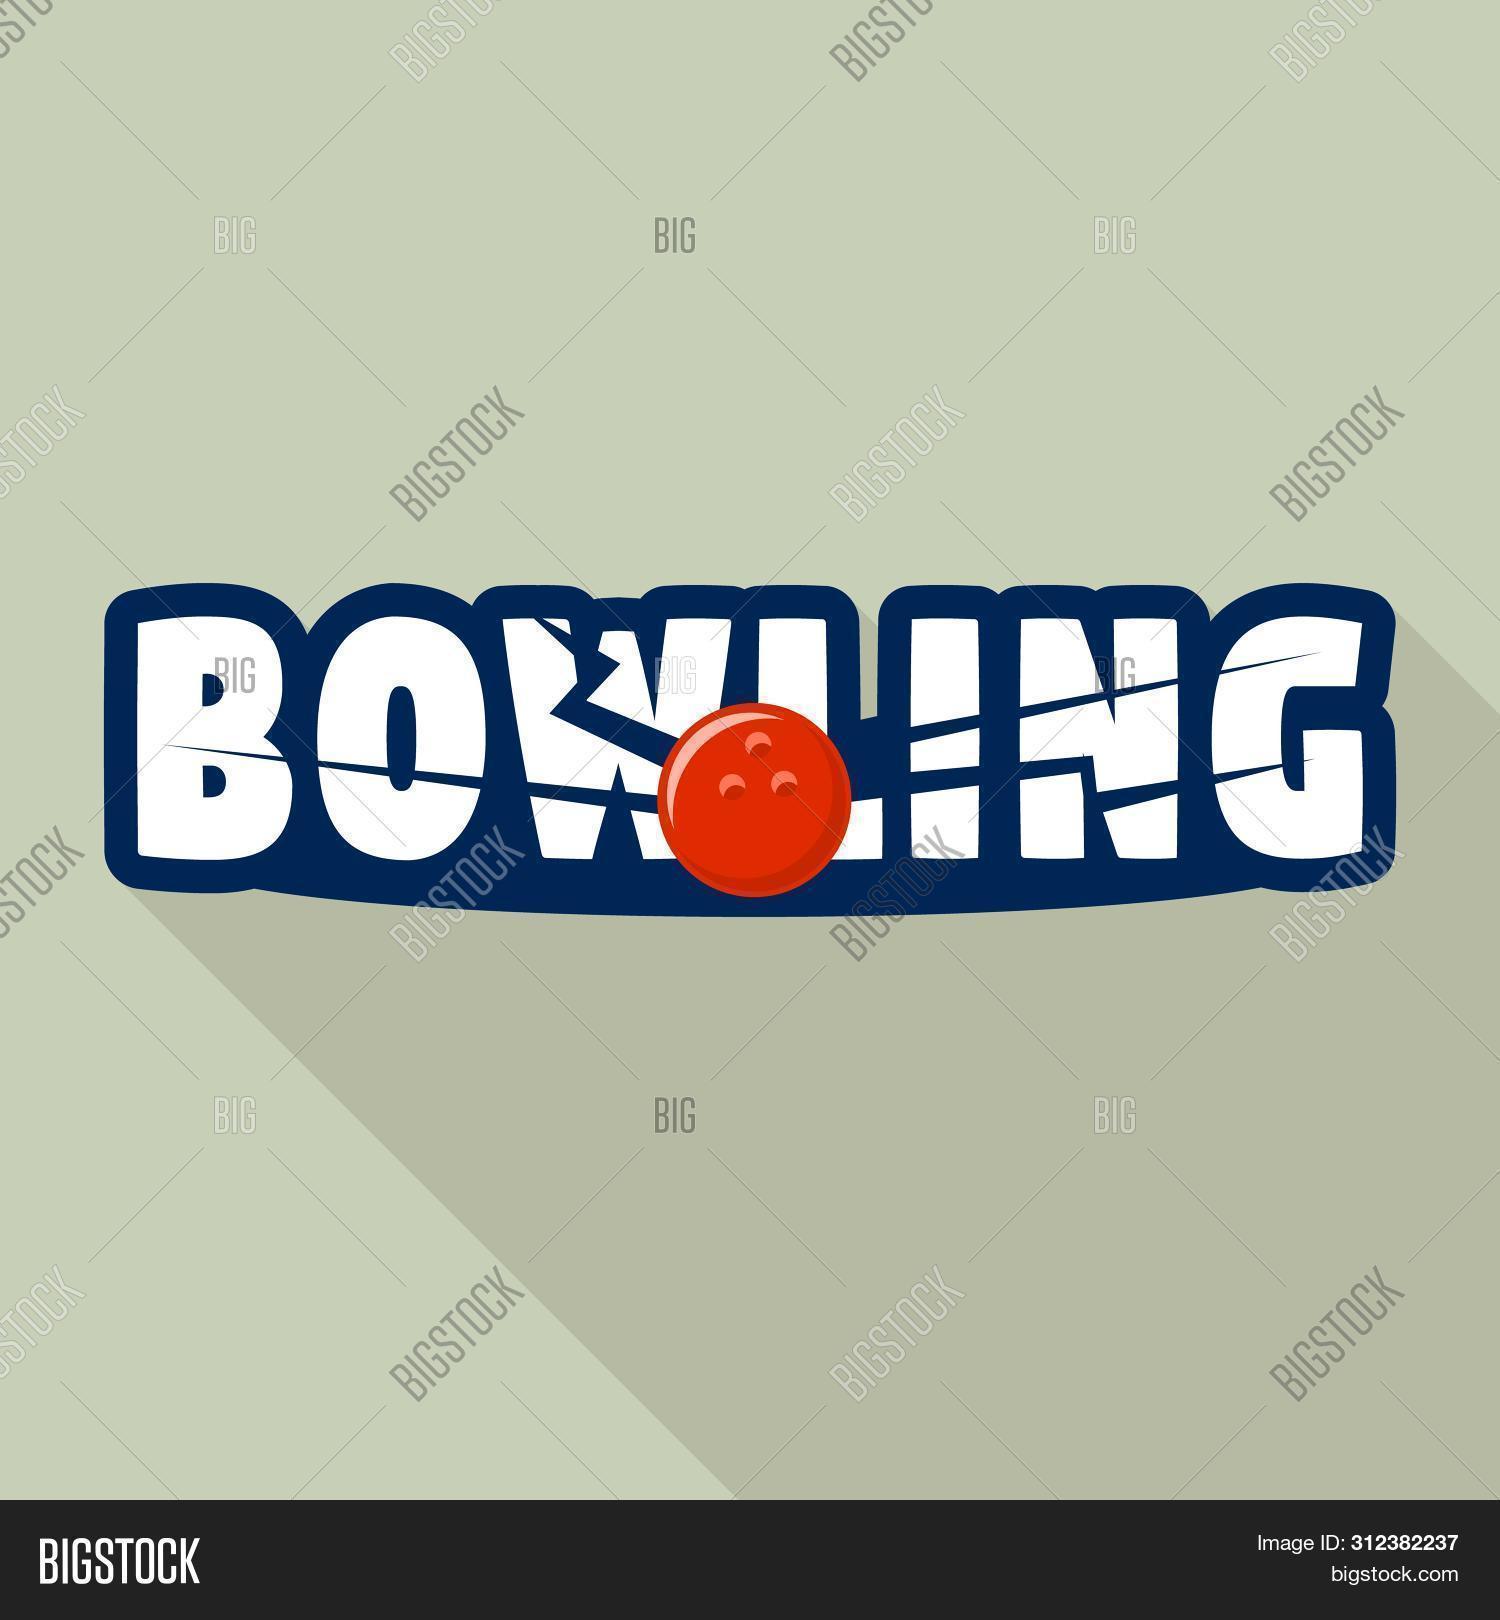 Bowling Strike Logo. Flat Illustration Of Bowling Strike Logo For Web Design